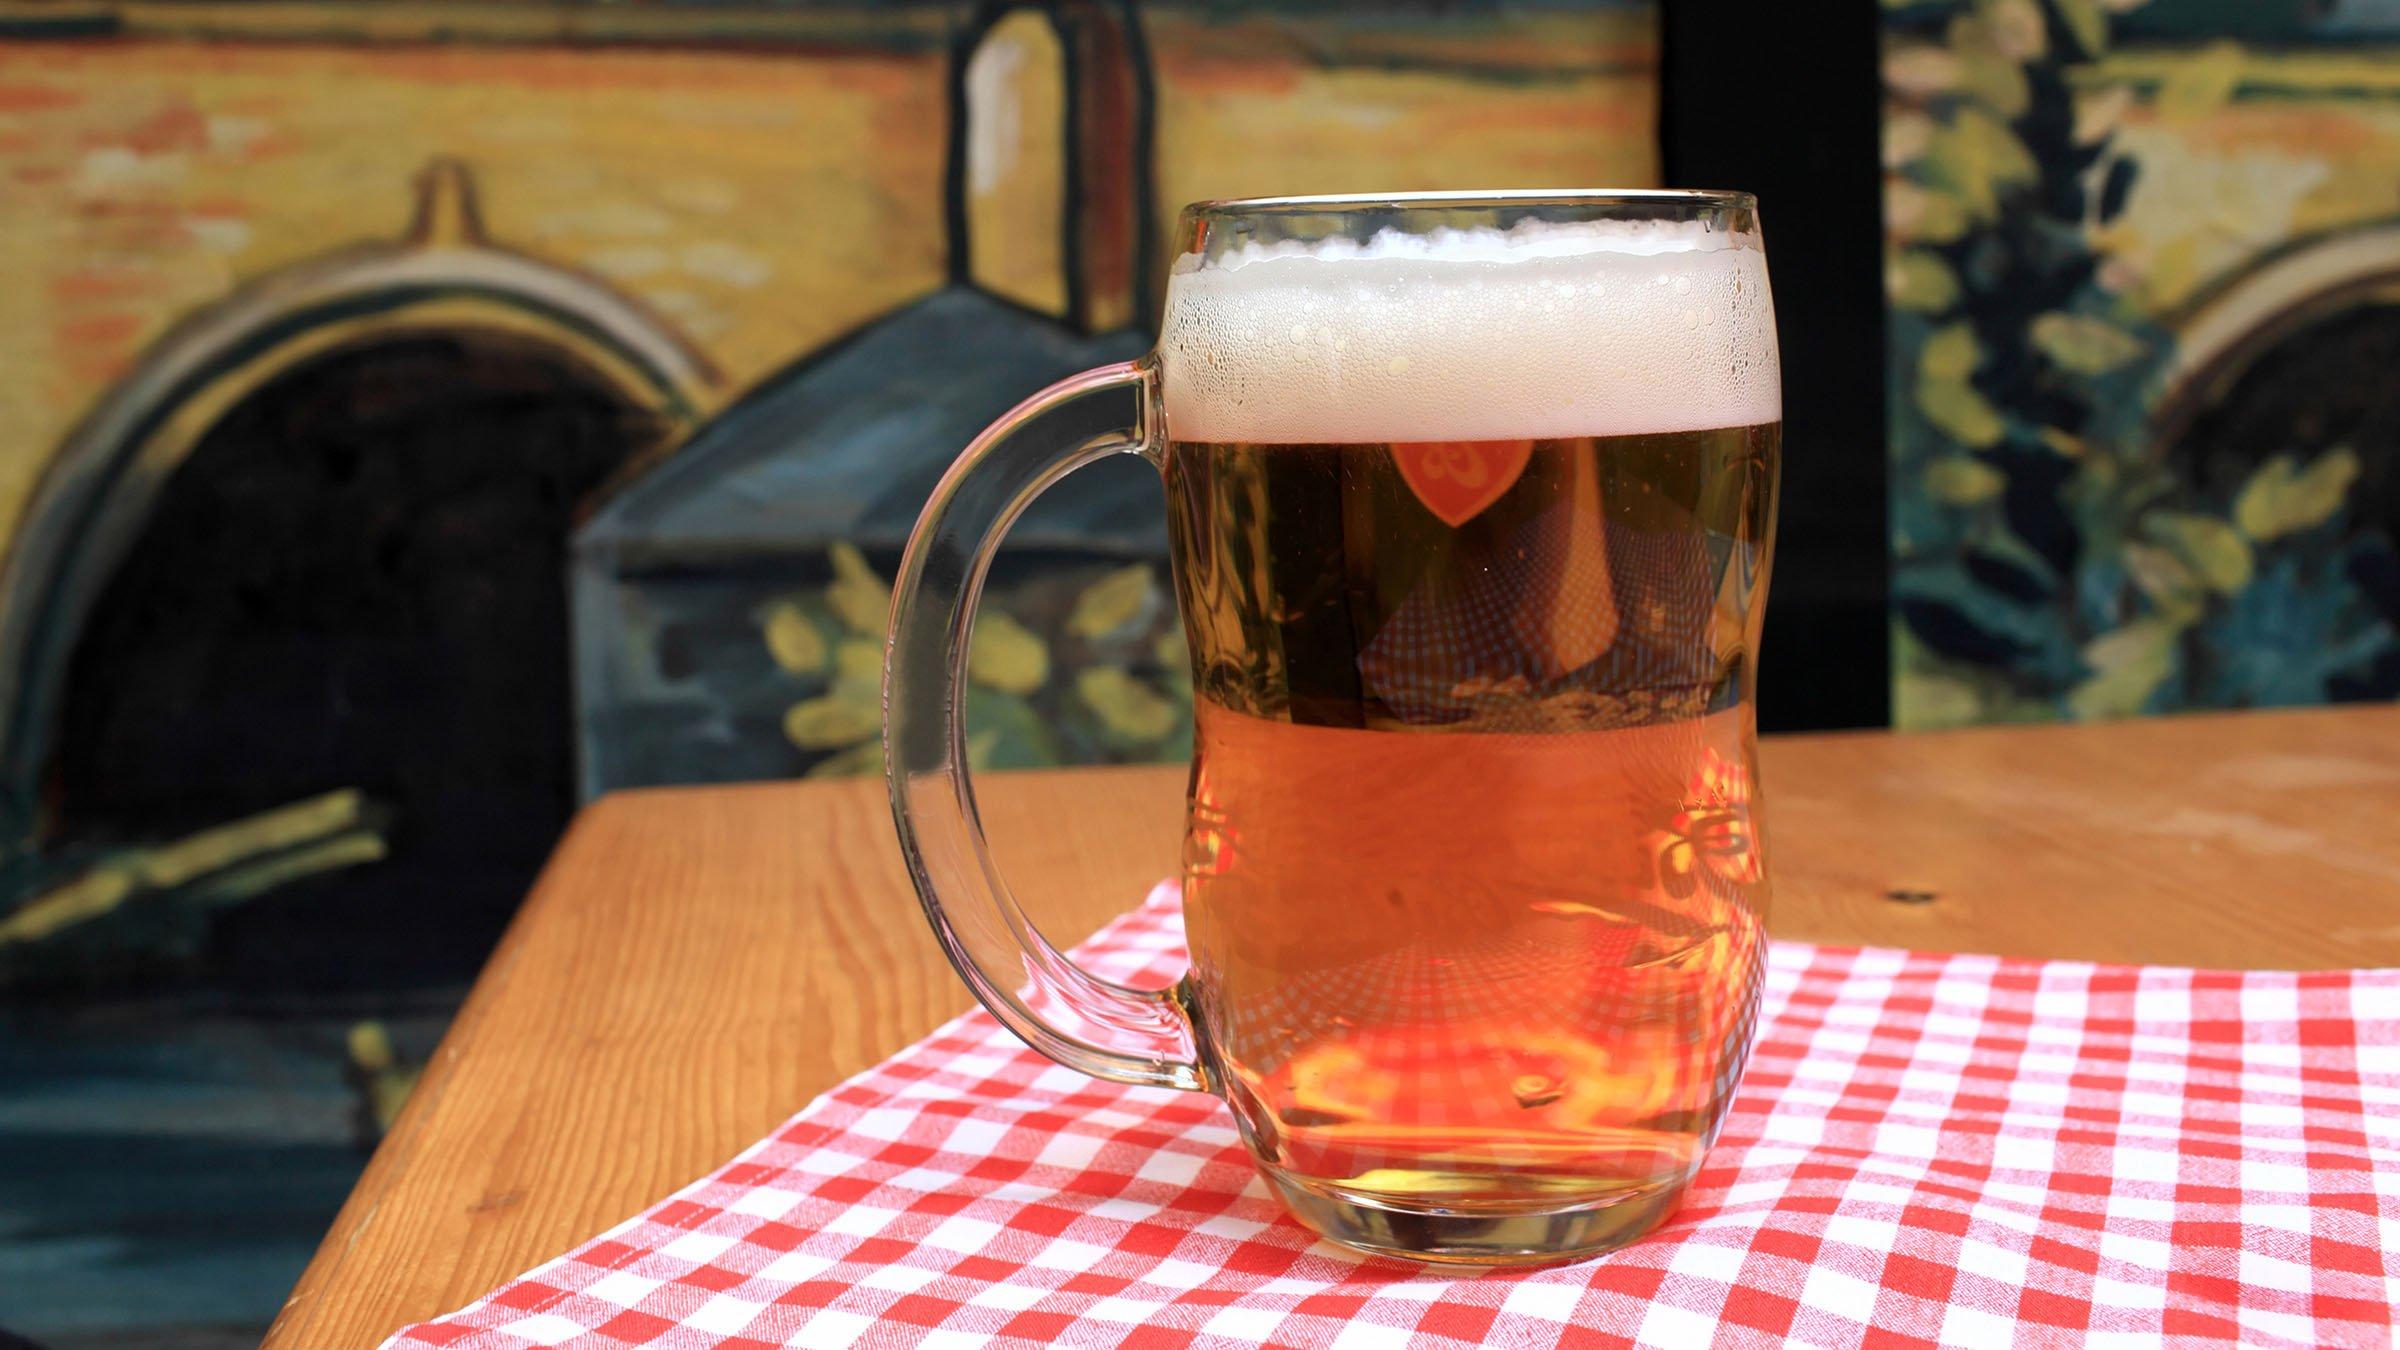 Cata de cerveza Zaragoza